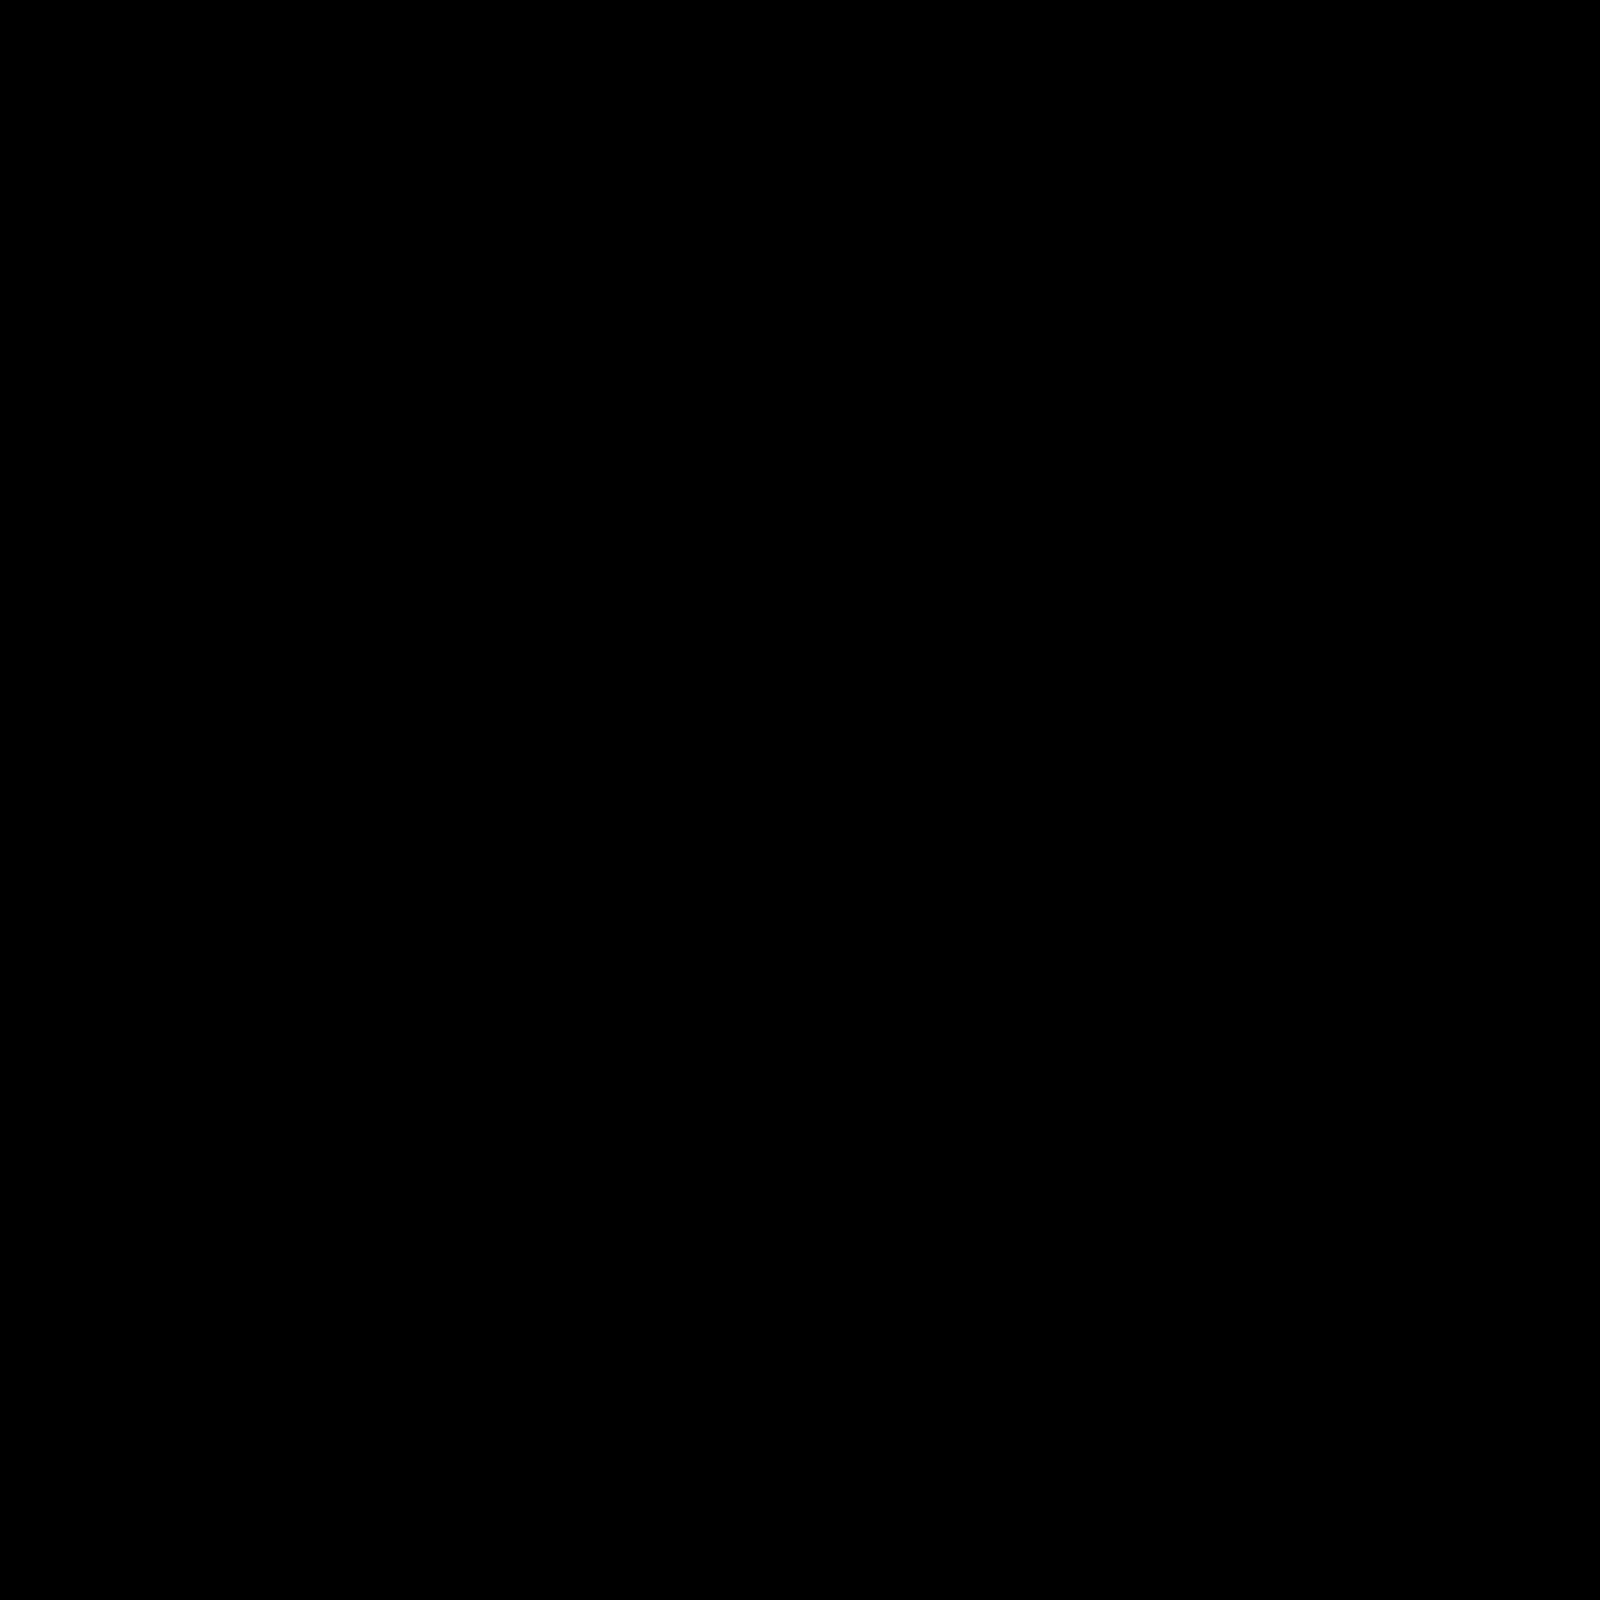 Plug Filled icon